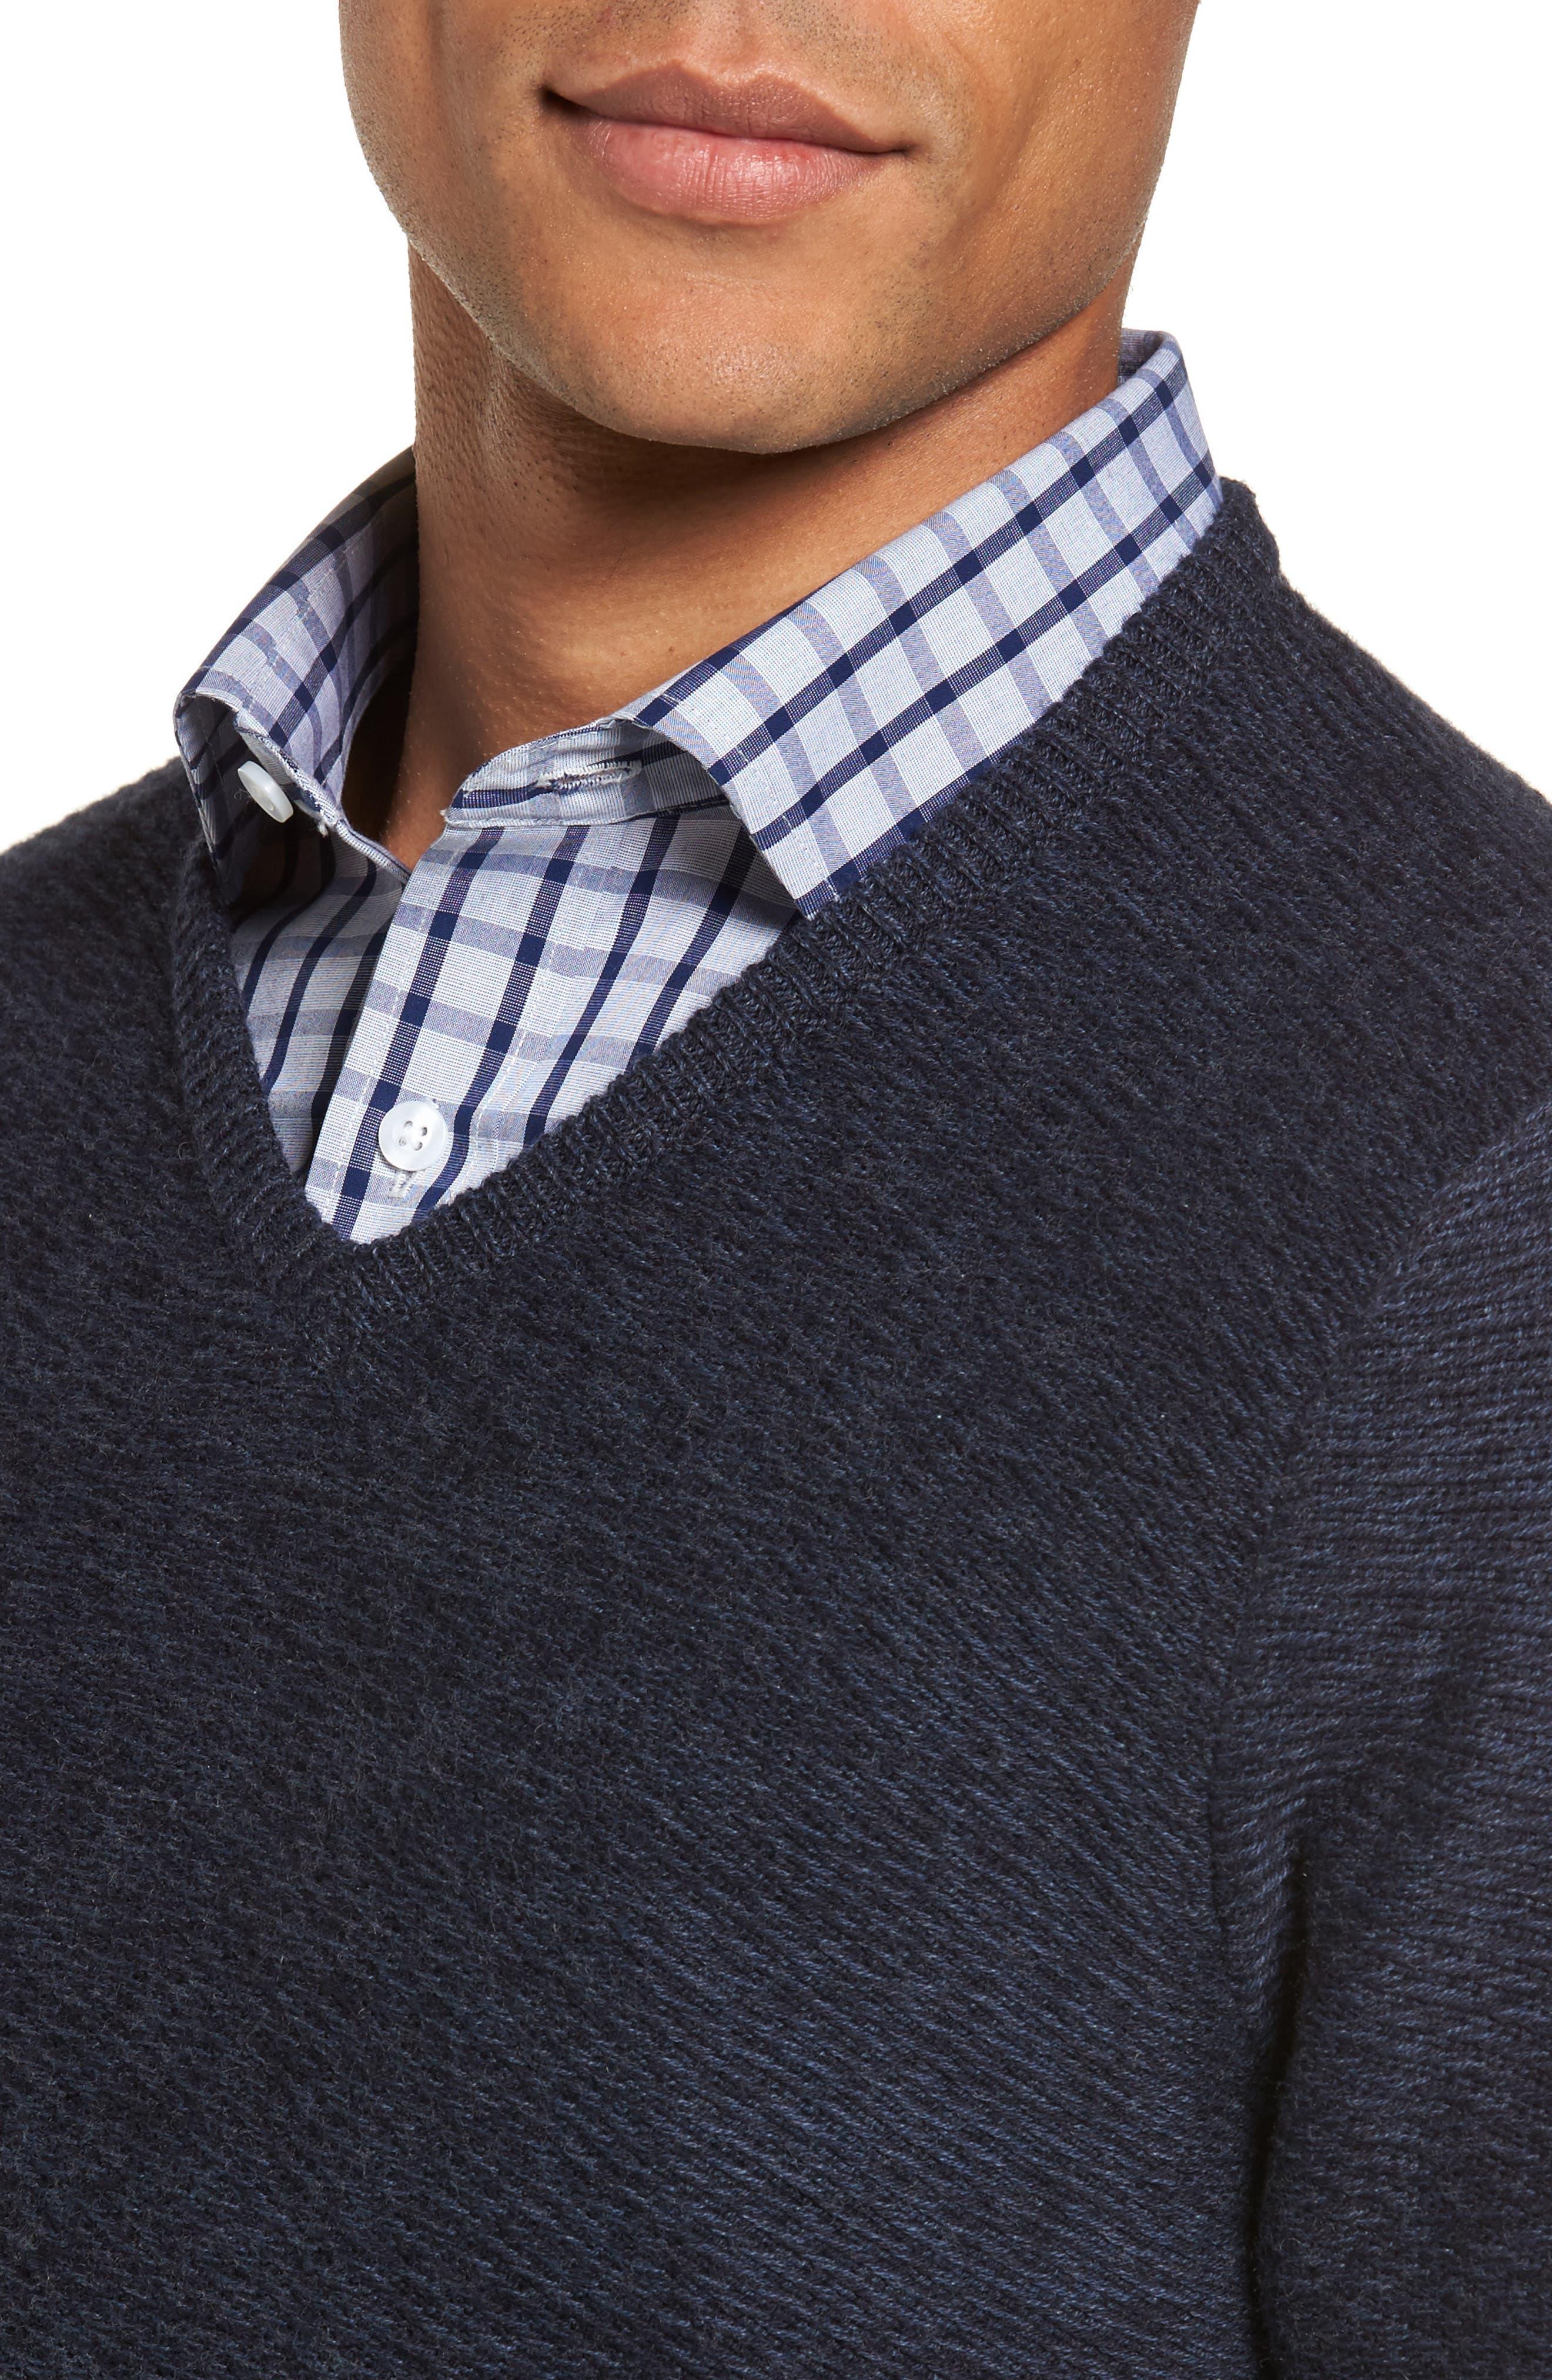 Cotton & Cashmere V-Neck Sweater,                             Alternate thumbnail 4, color,                             410